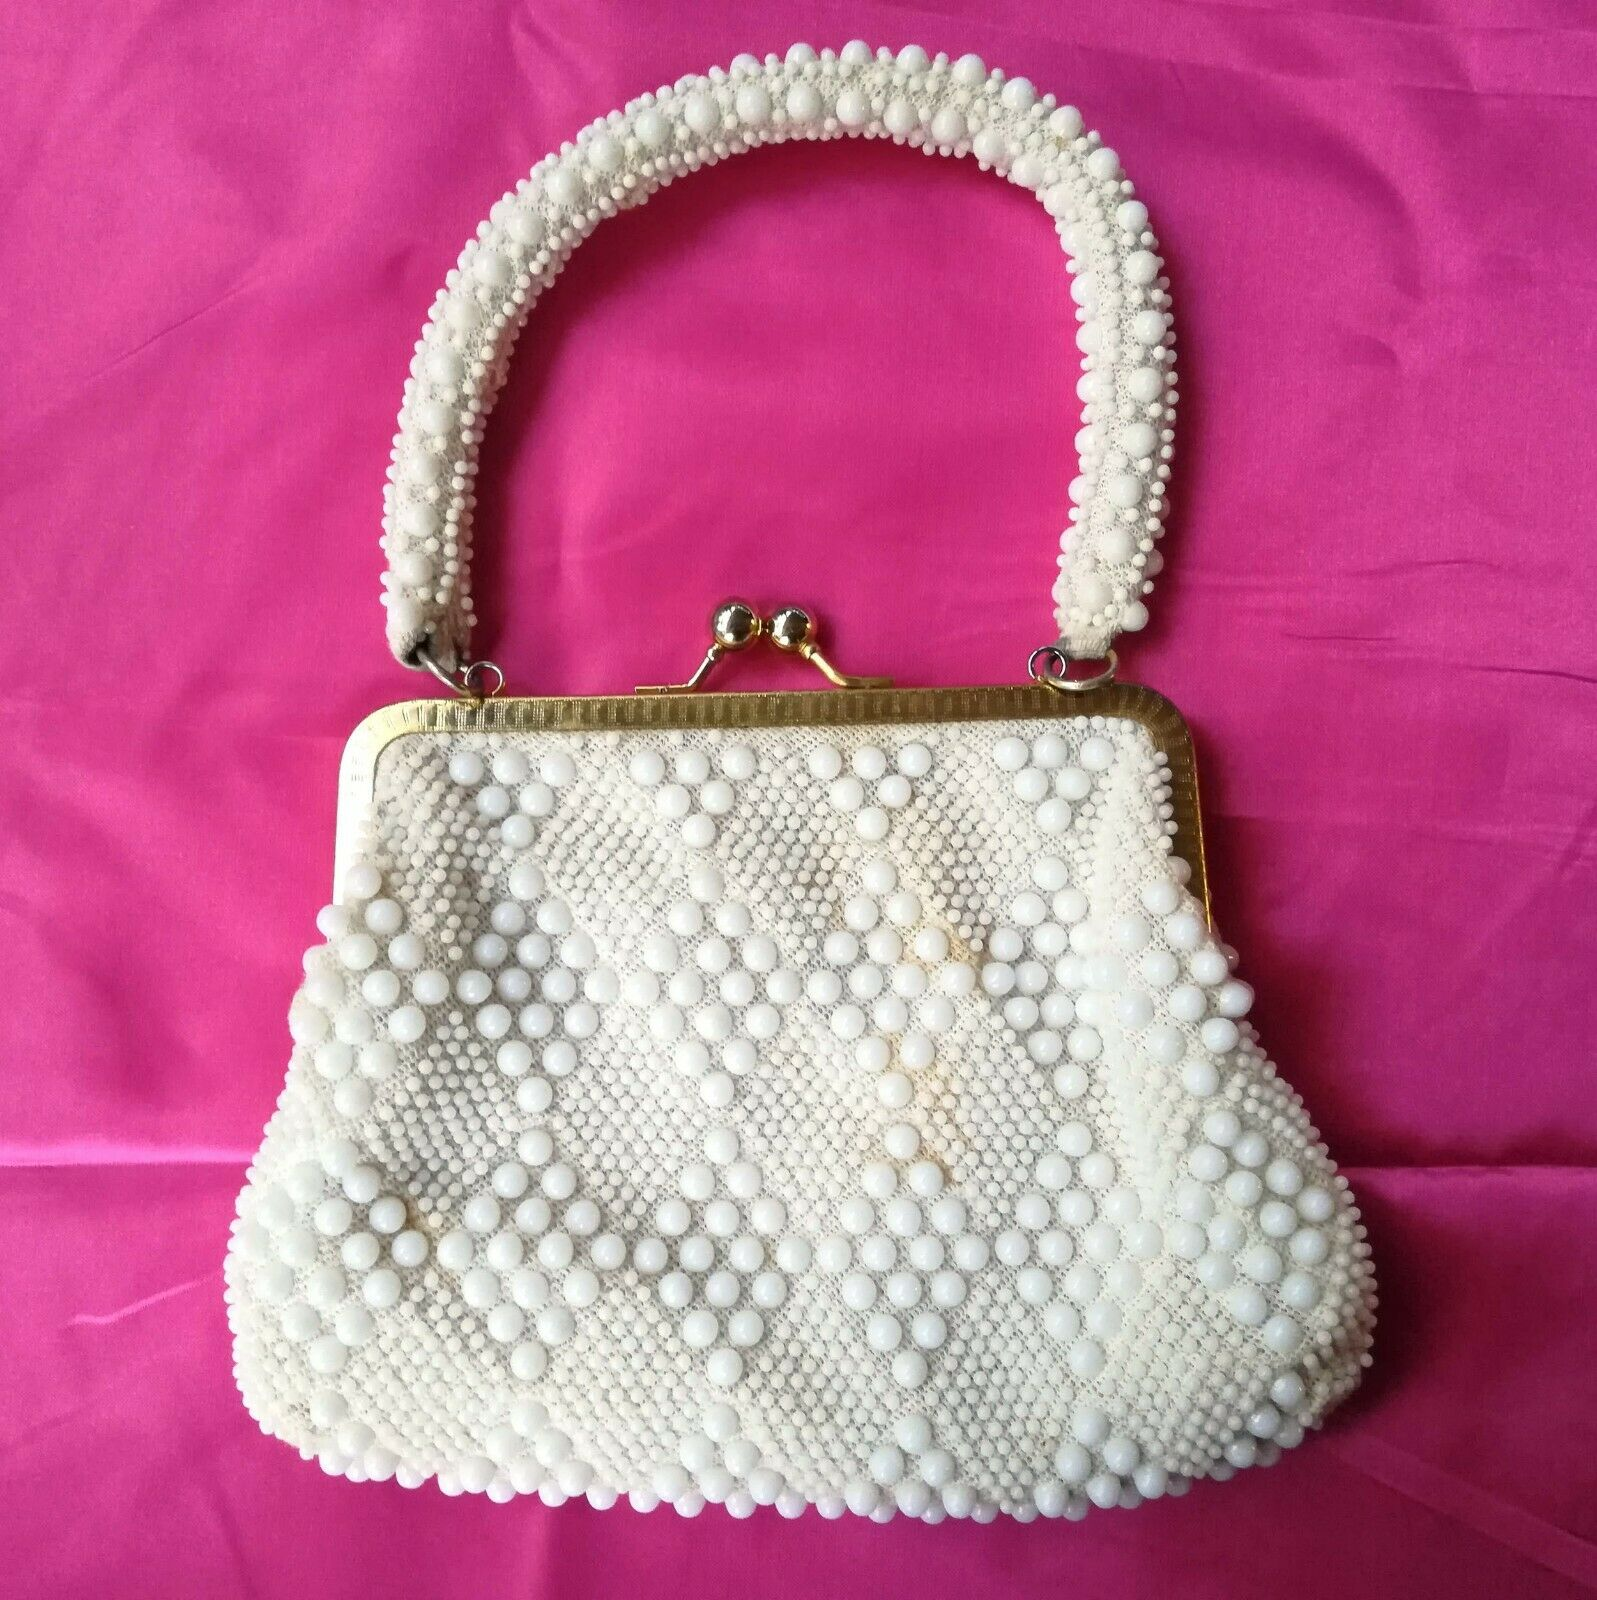 Vintage Beaded Handbag Cream White Hand Made in Hong Kong 1950s